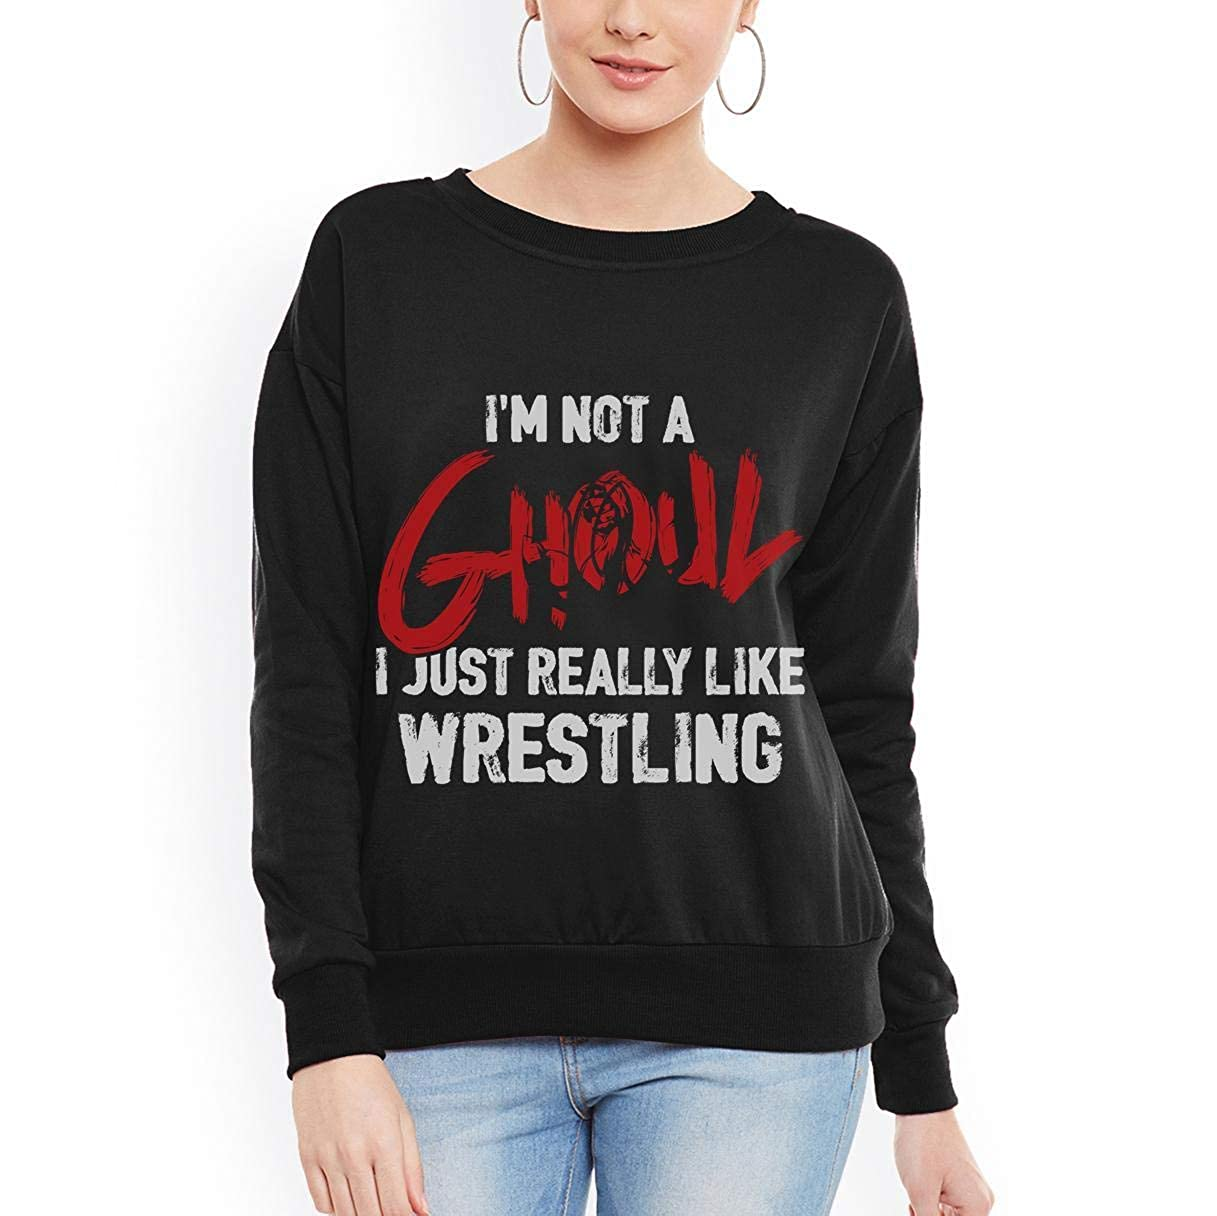 Wrestling I AM NOT A Ghoul Unisex Sweatshirt tee